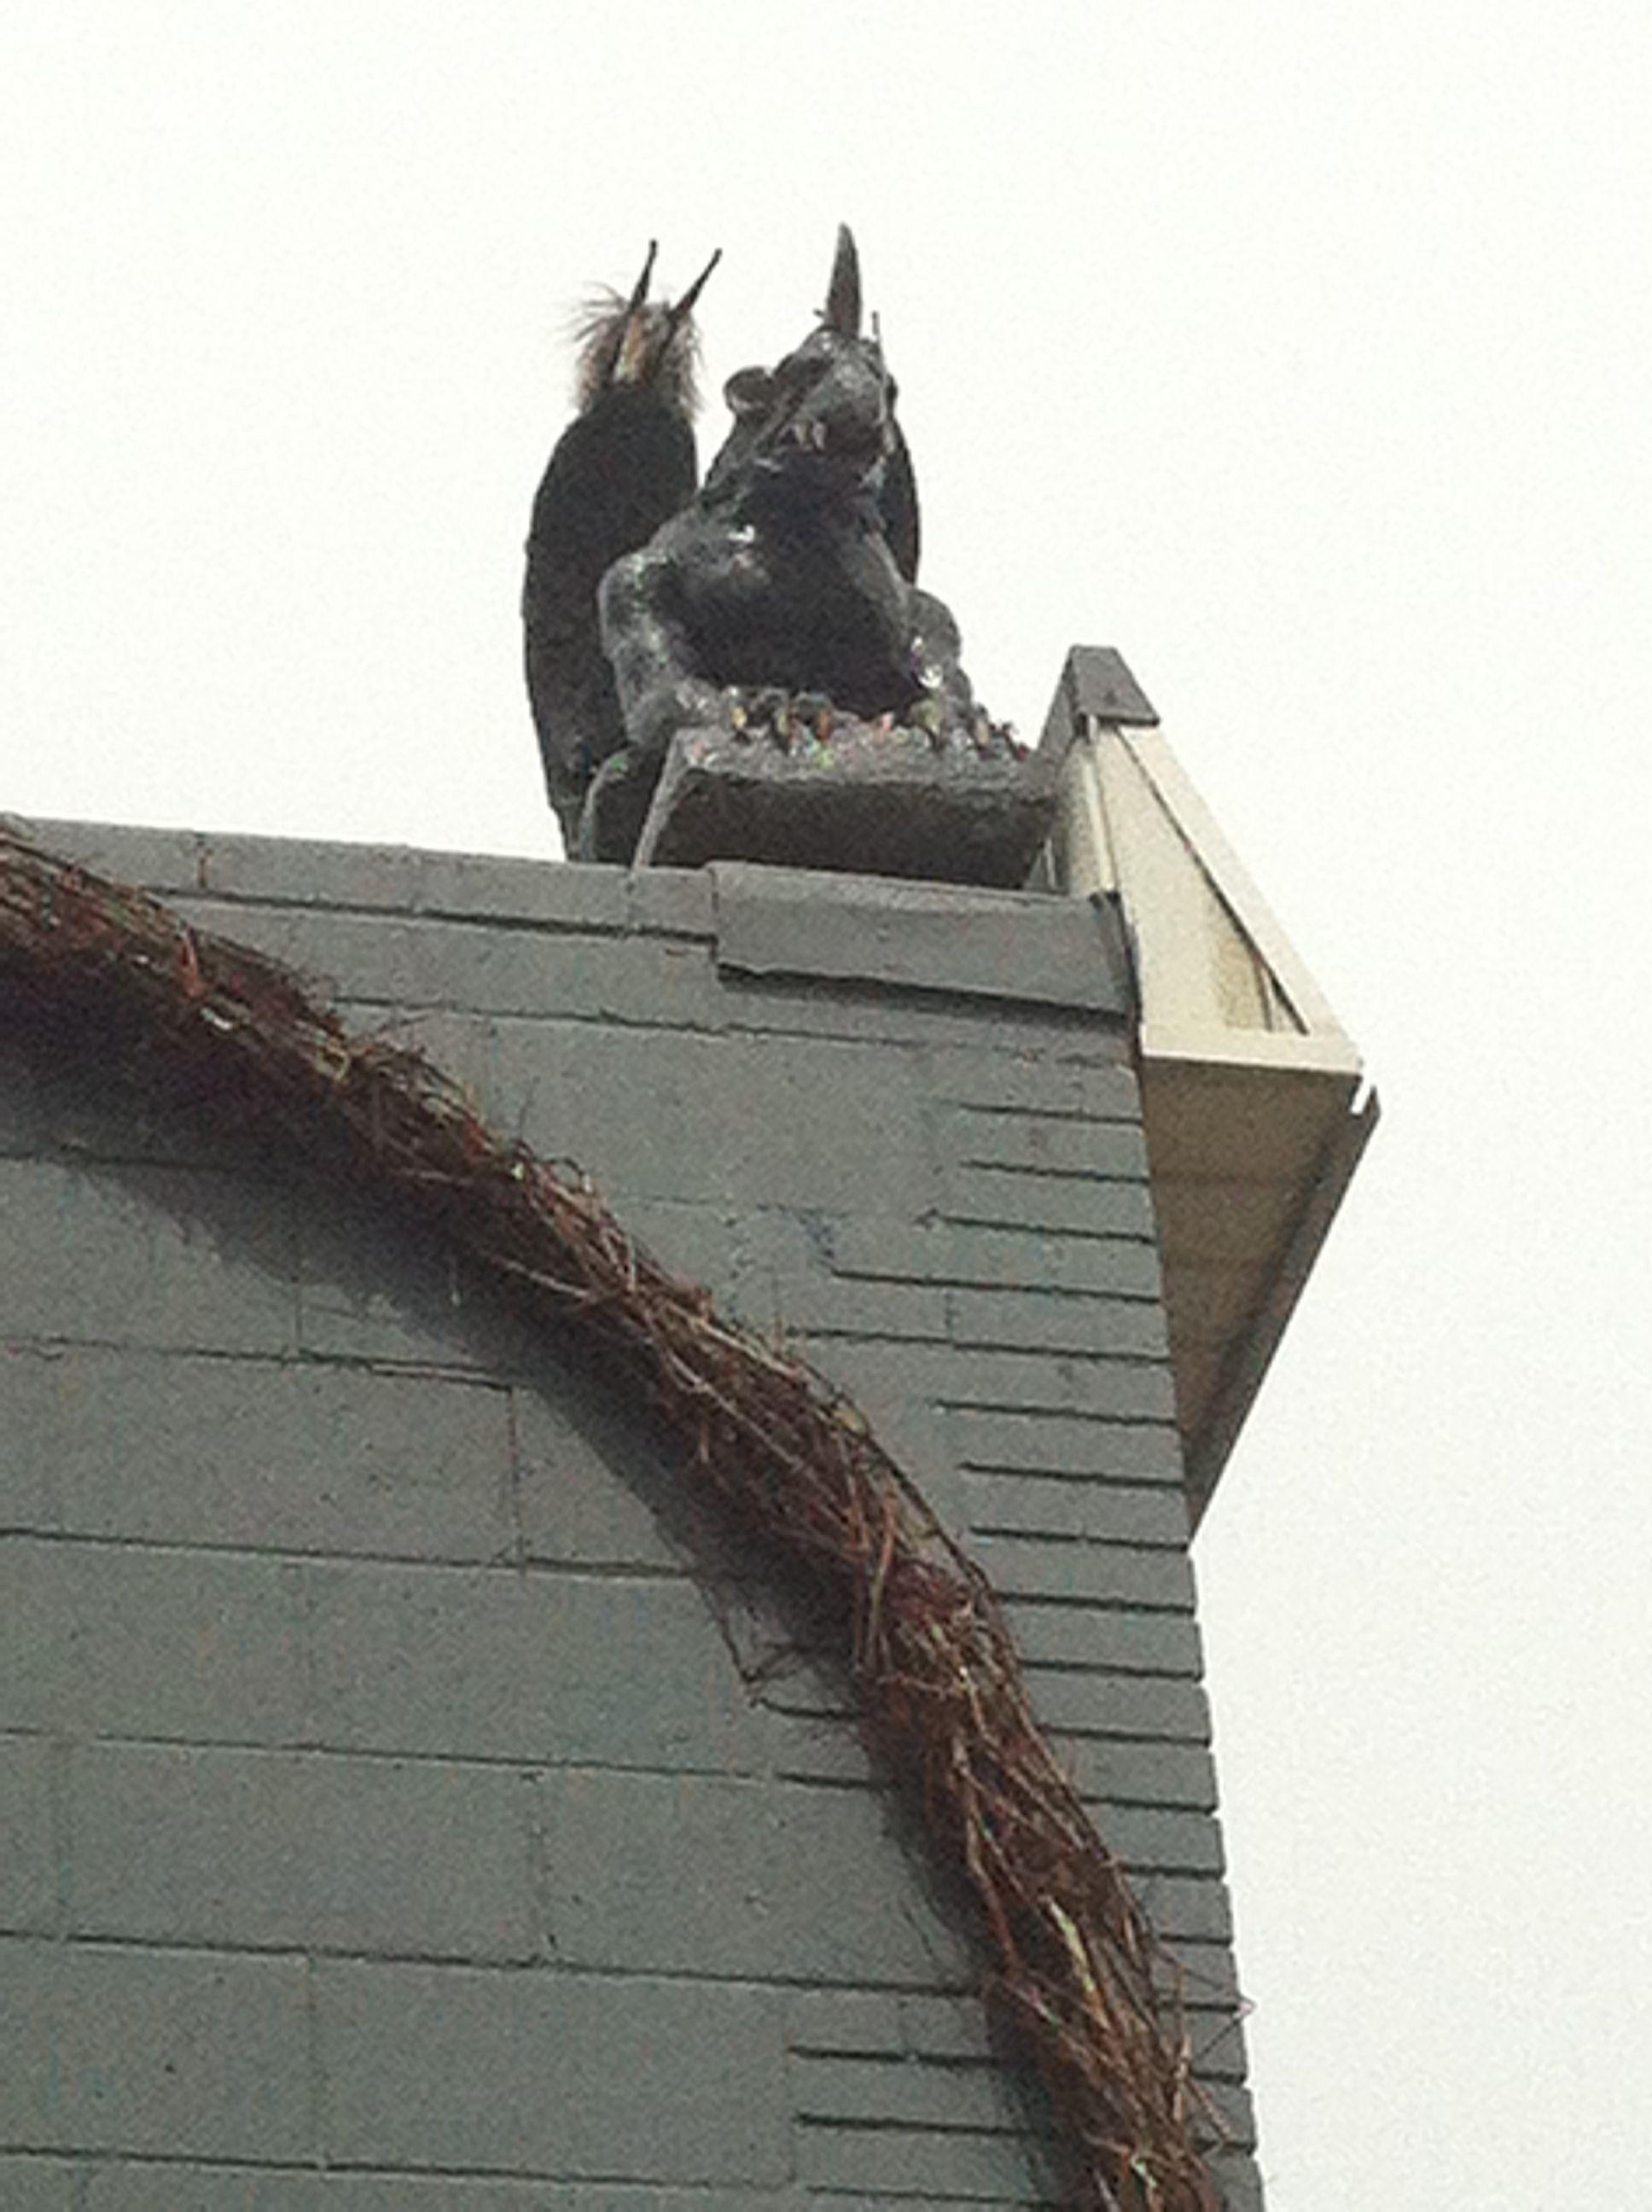 Gargoyle gargoyles lion sculpture statue